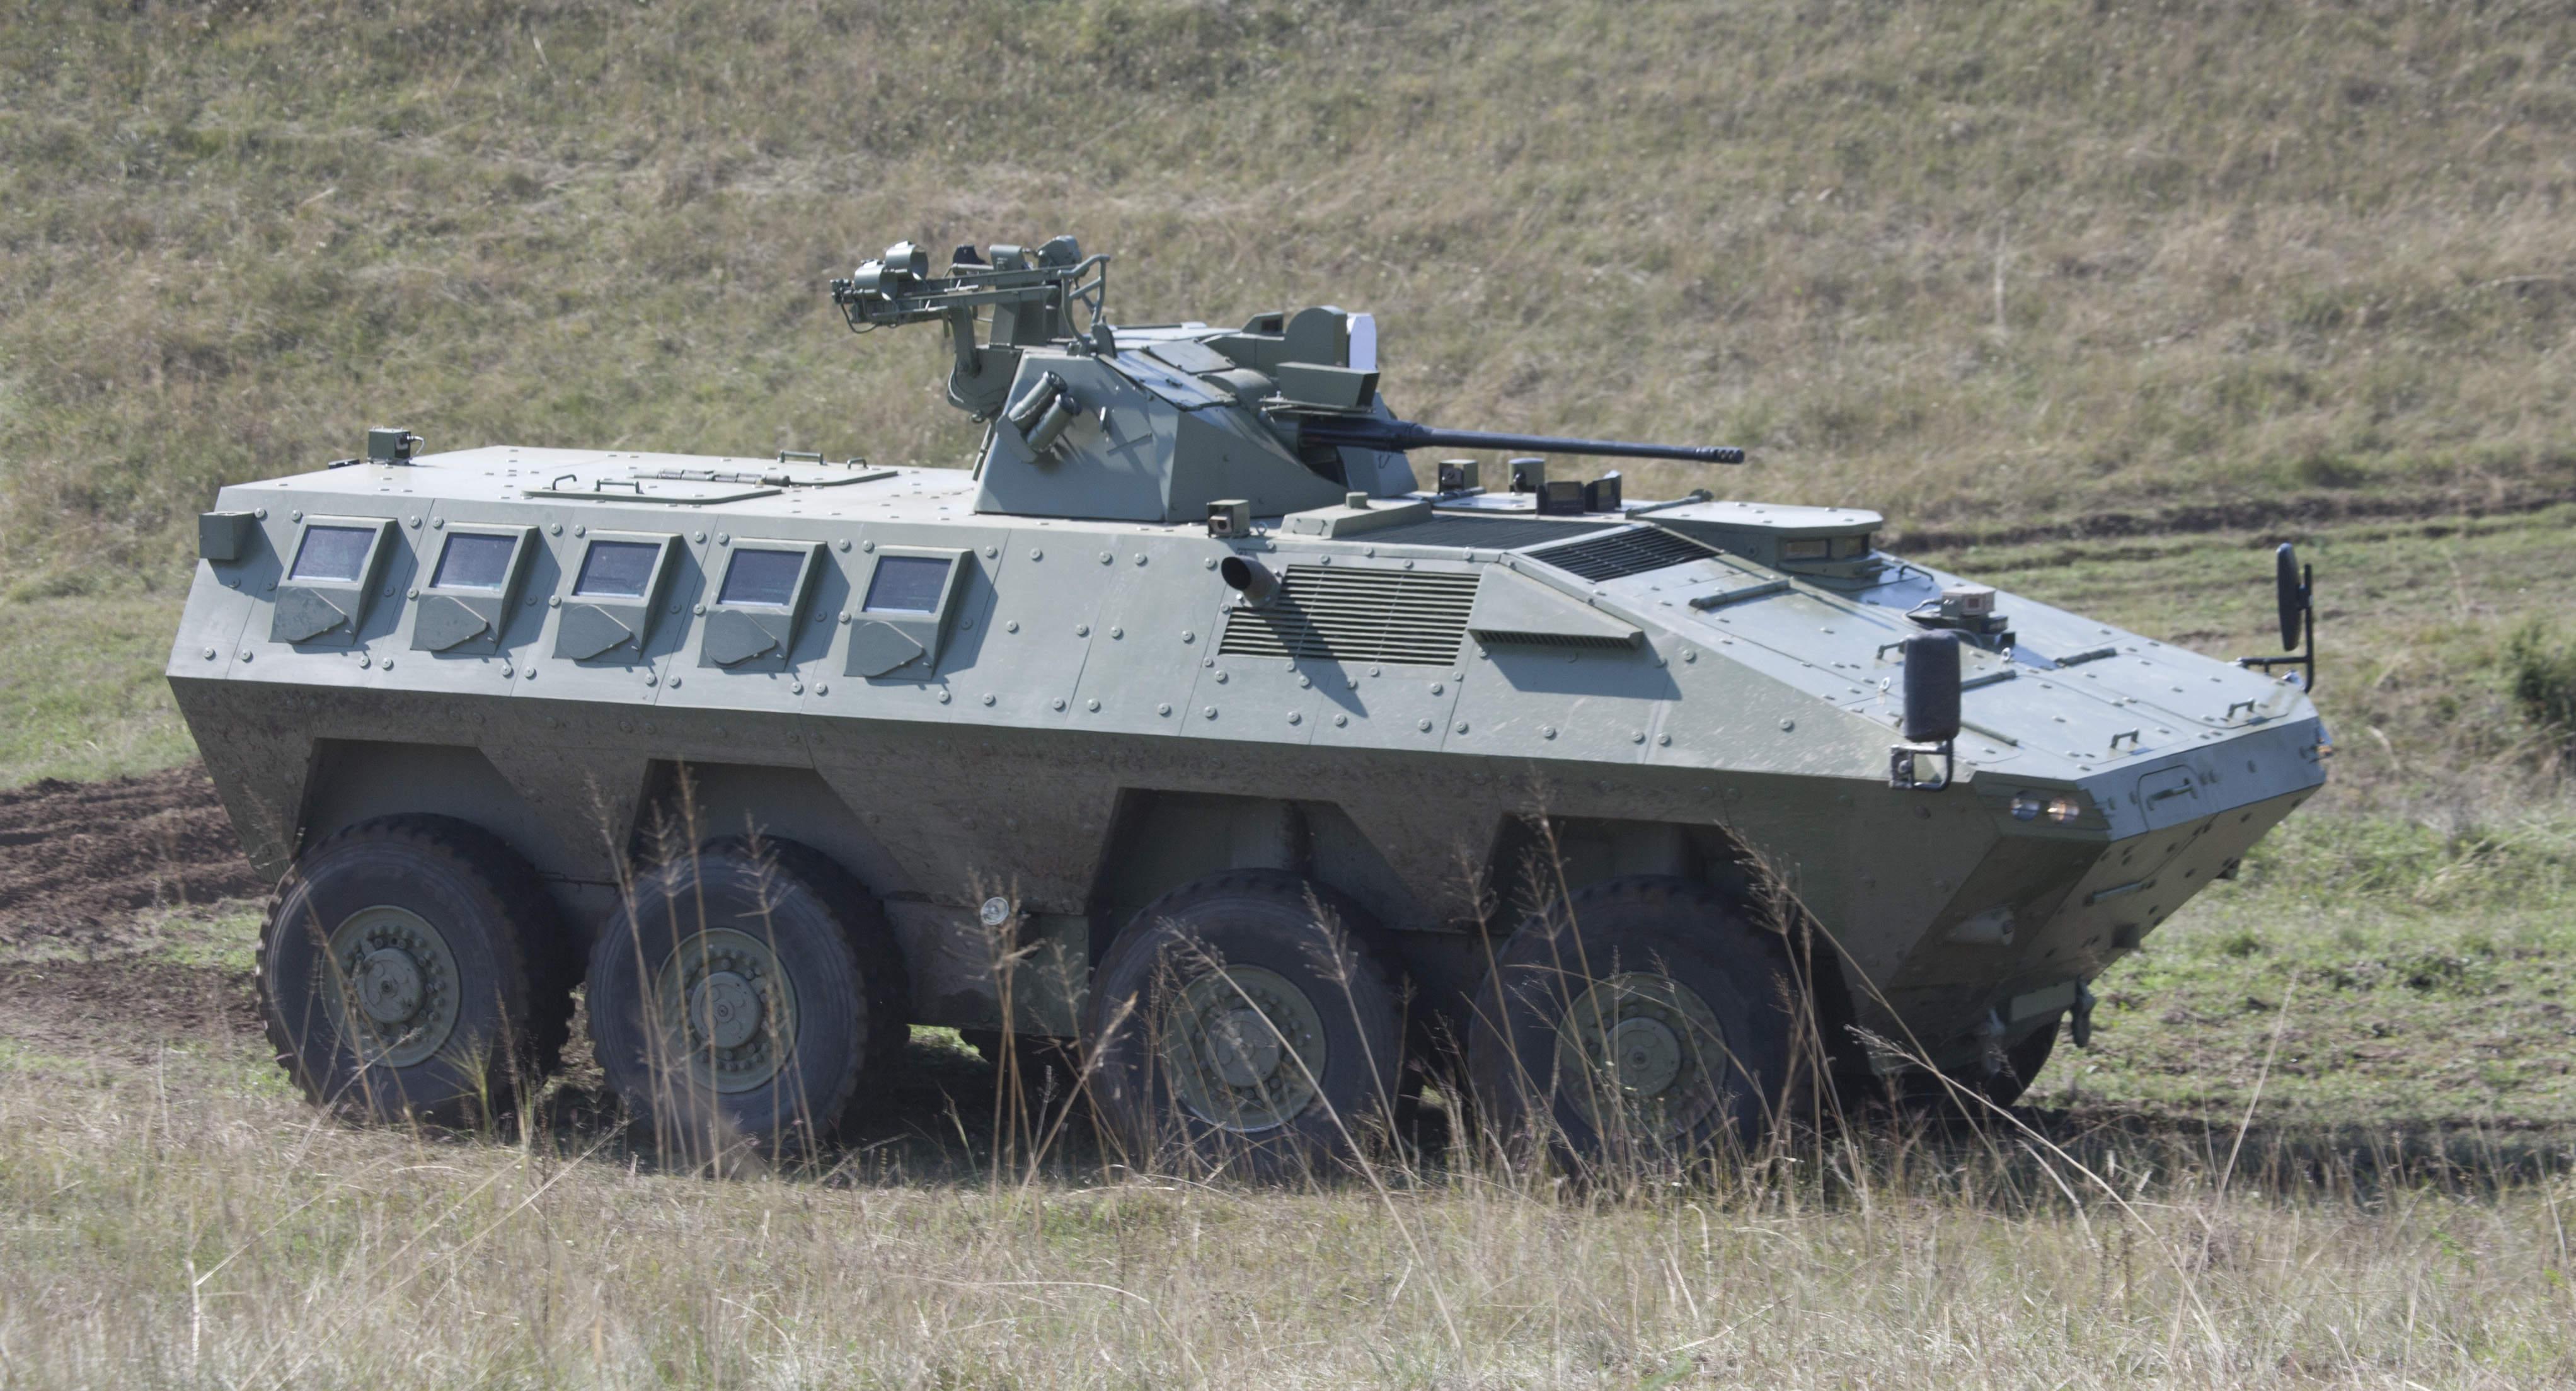 A green tank